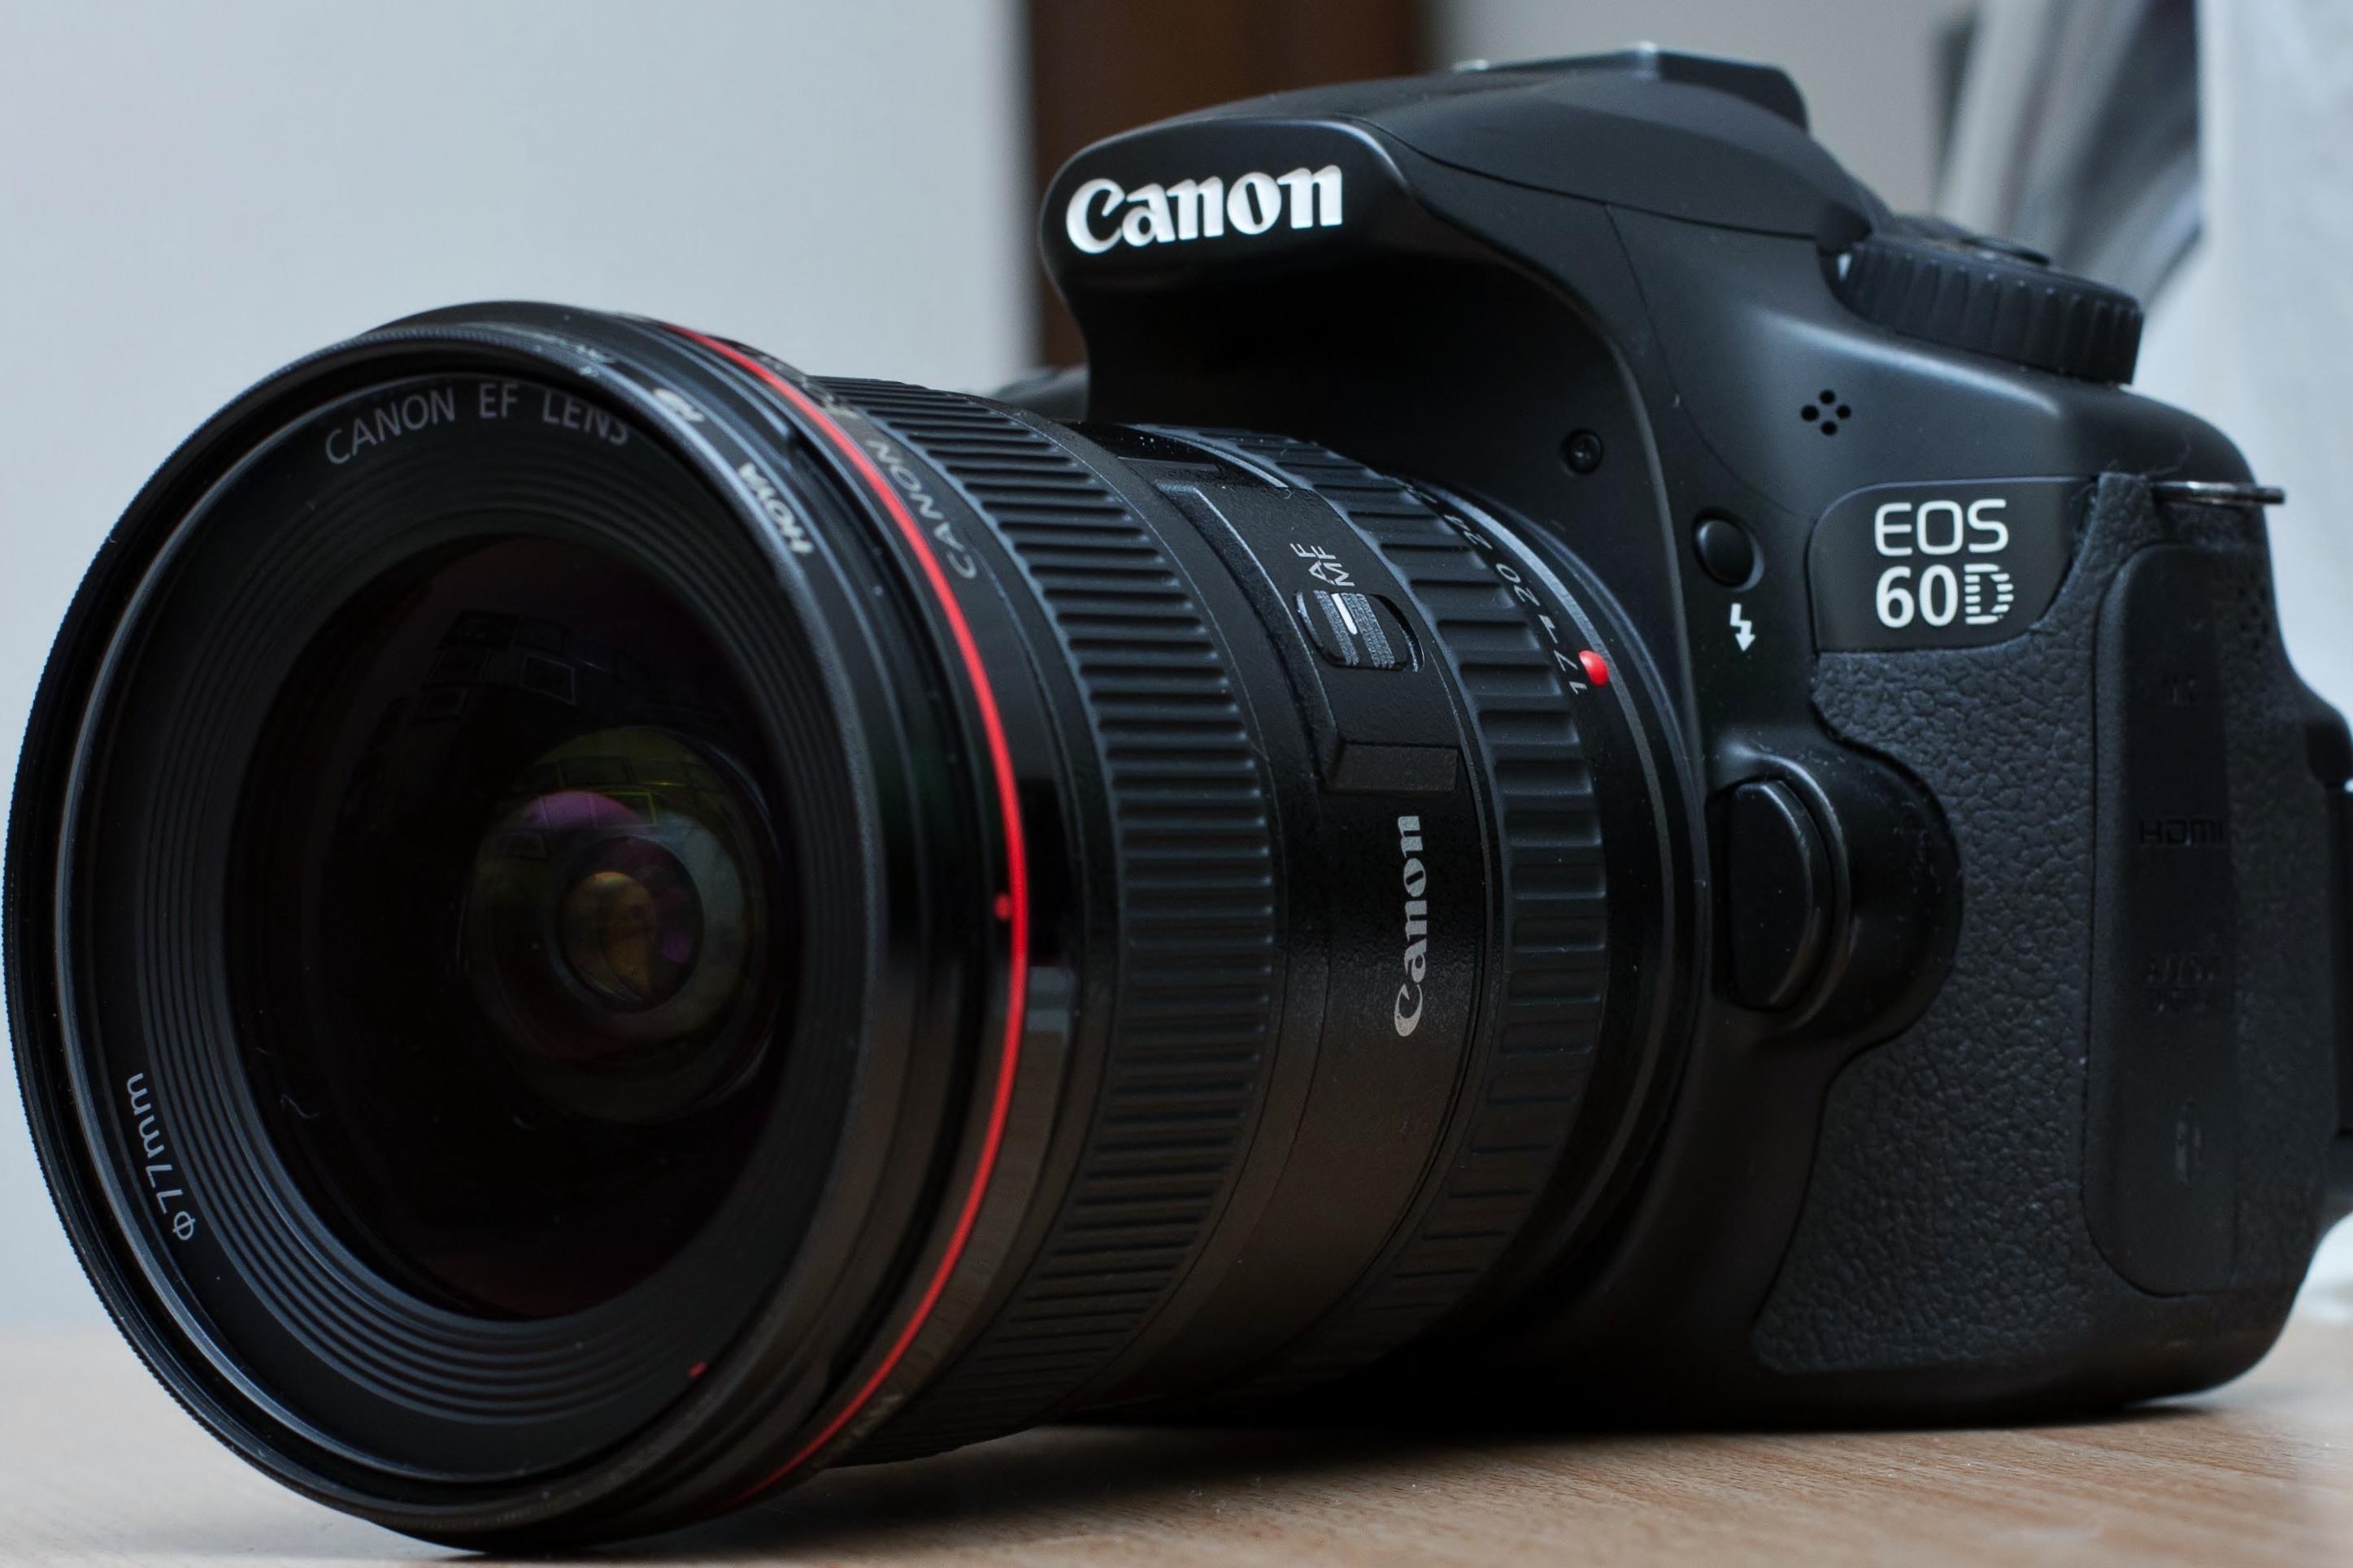 Camera Dslr Camera Canon 1100d dslr camera canon 1100d home design eos 60d camera